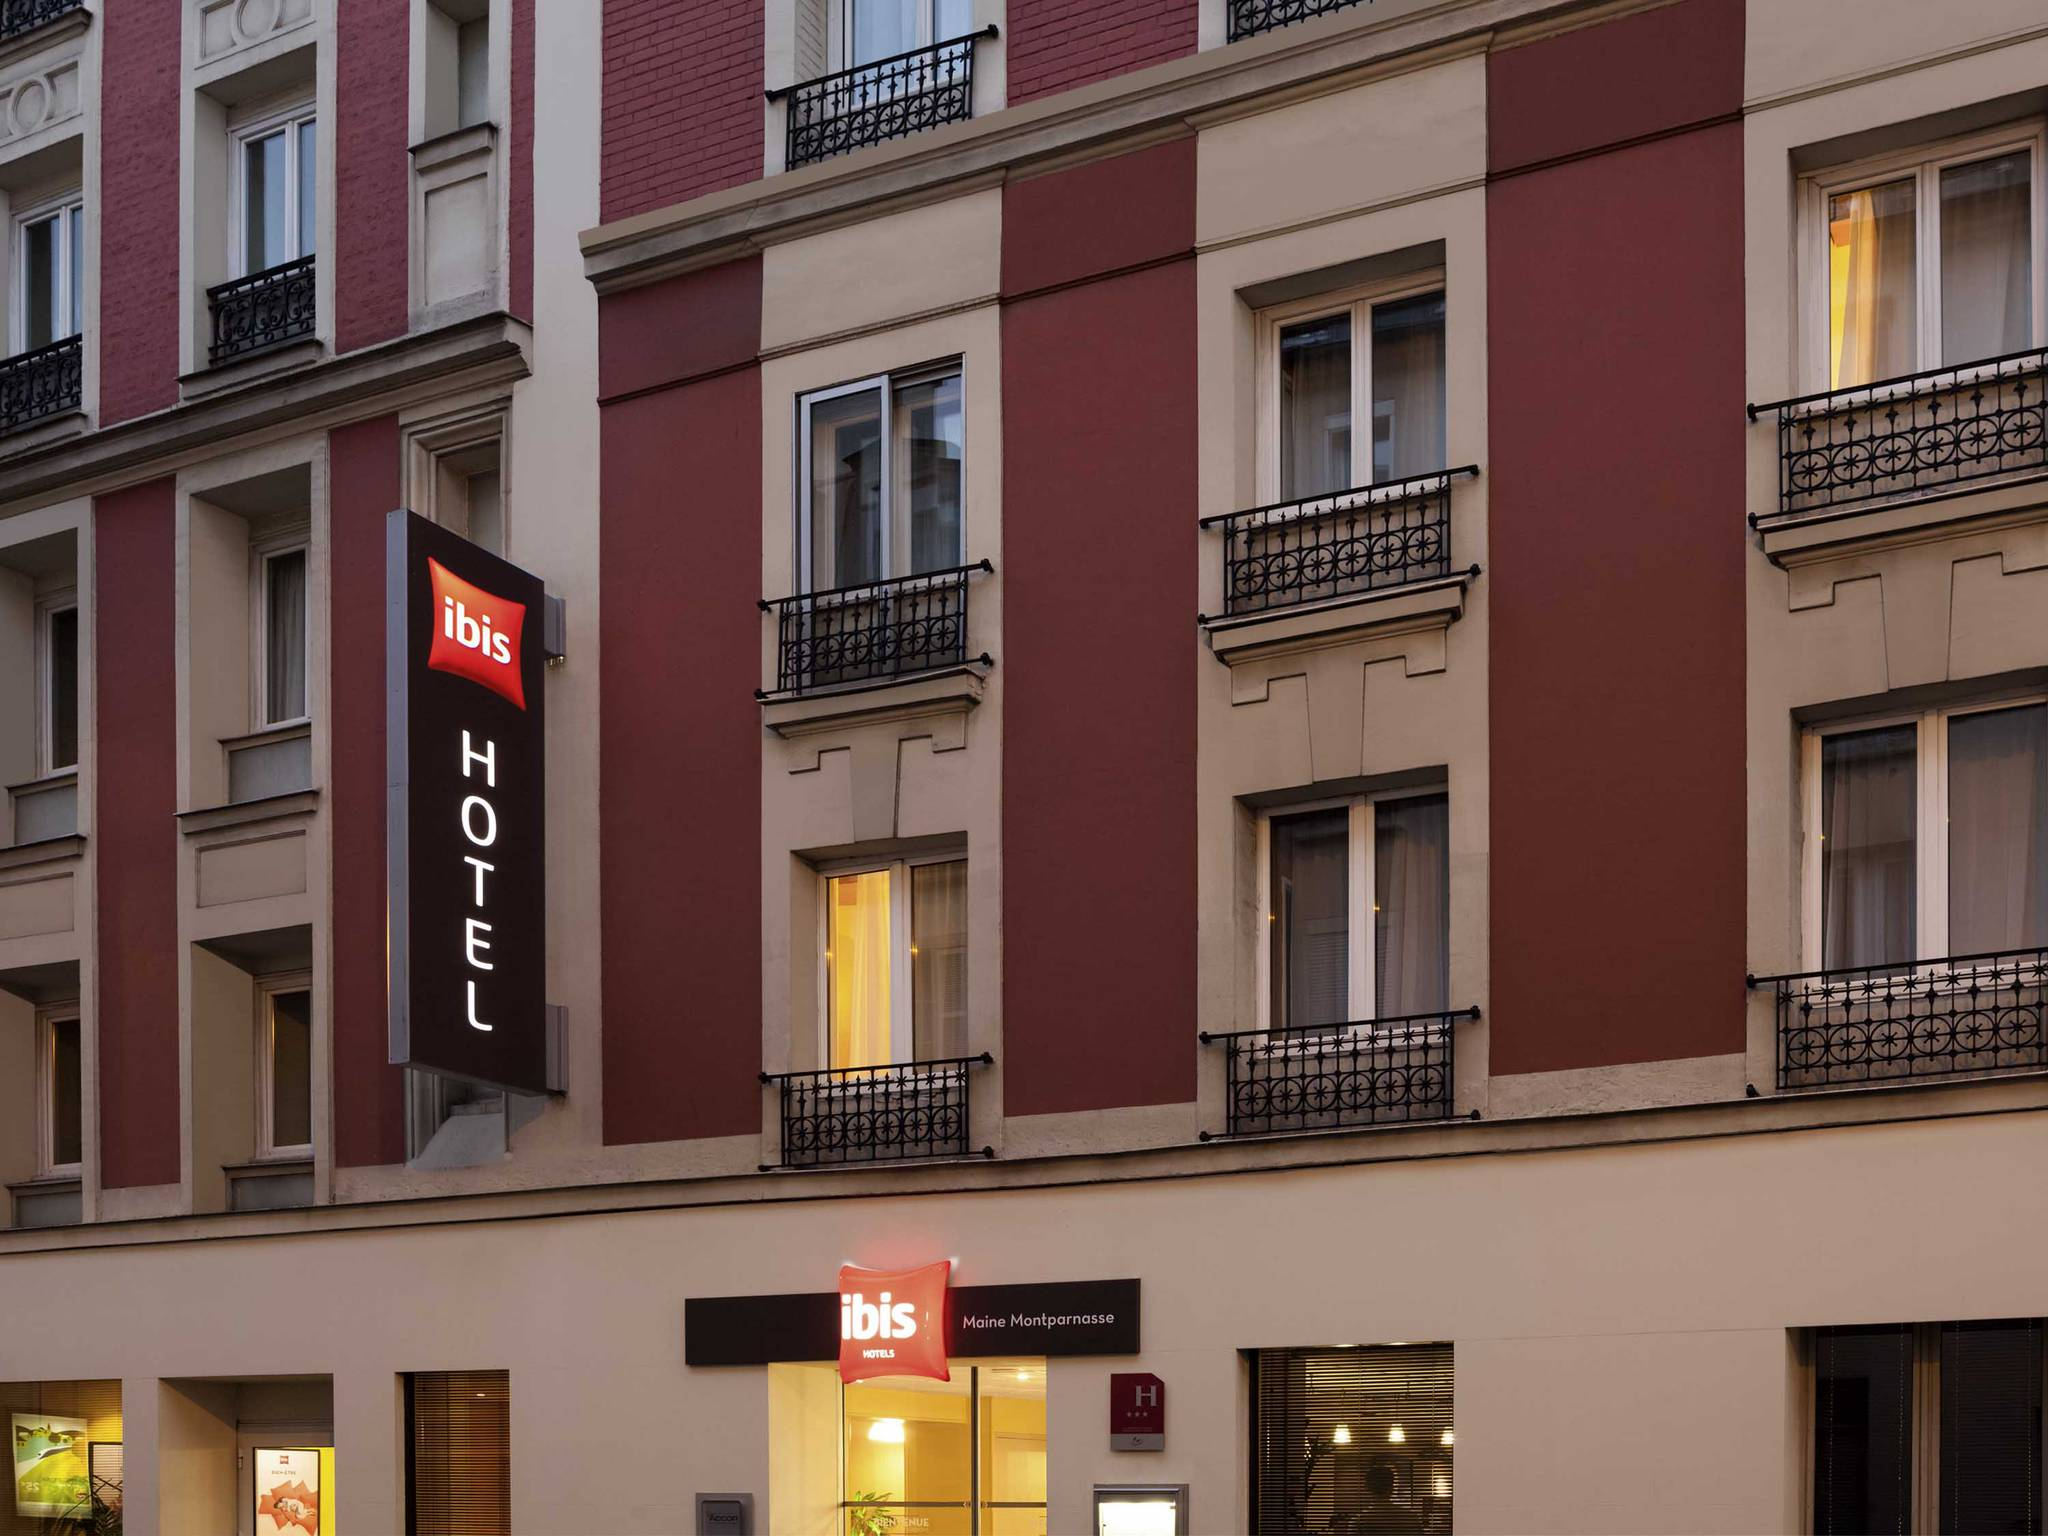 فندق - إيبيس ibis باريس مين مونبارناس الدائرة 14